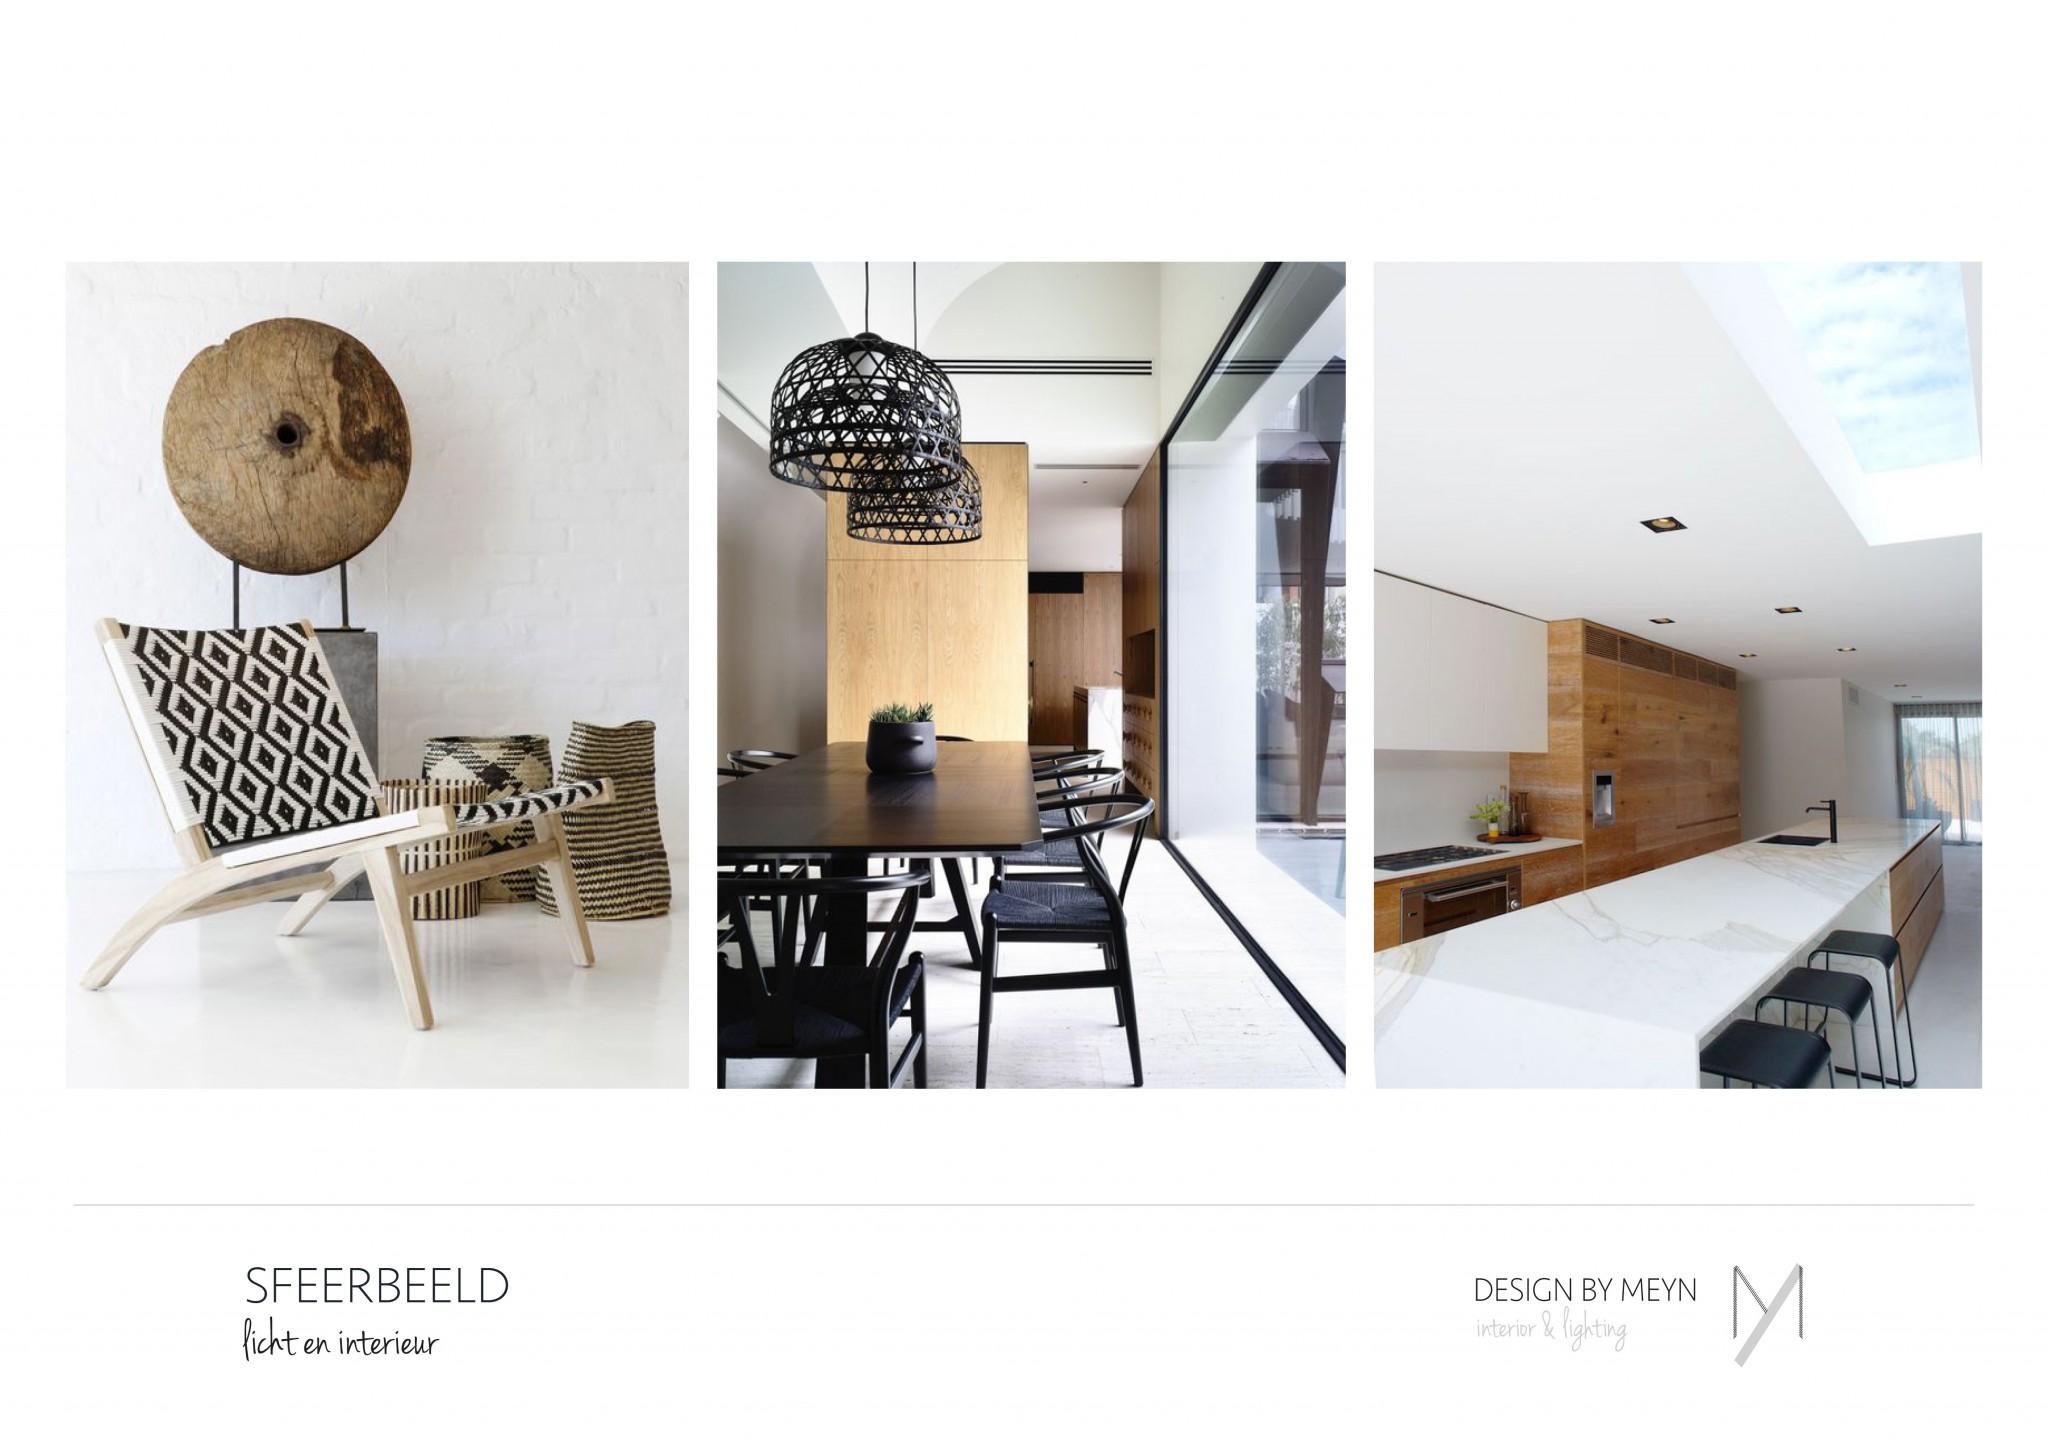 http://www.designbymeyn.com/wp-content/uploads/2016/08/Design-by-Meyn-lichtplan-Deventer7.jpg